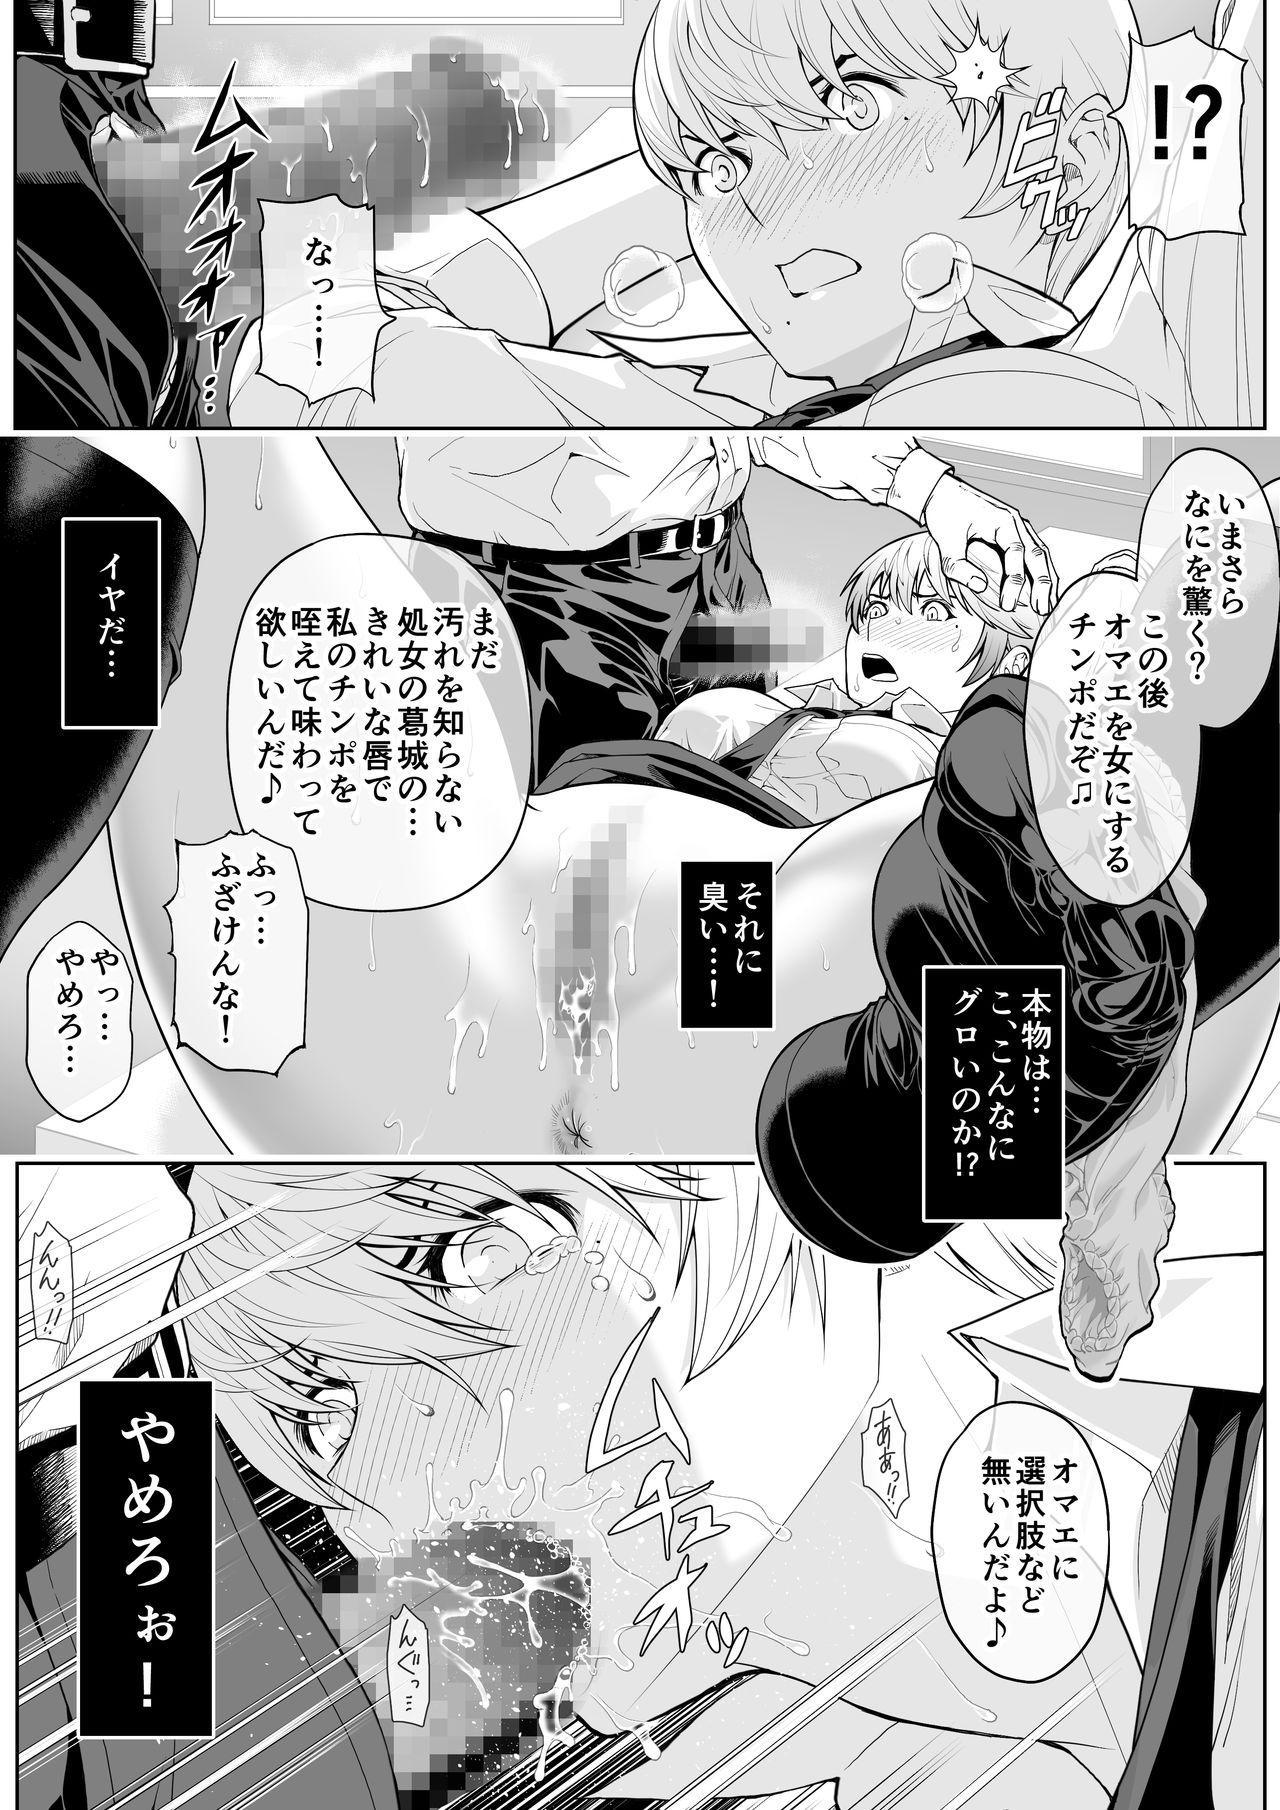 Namaiki mmusume ni tsuyo ● ikīki jugyō 30